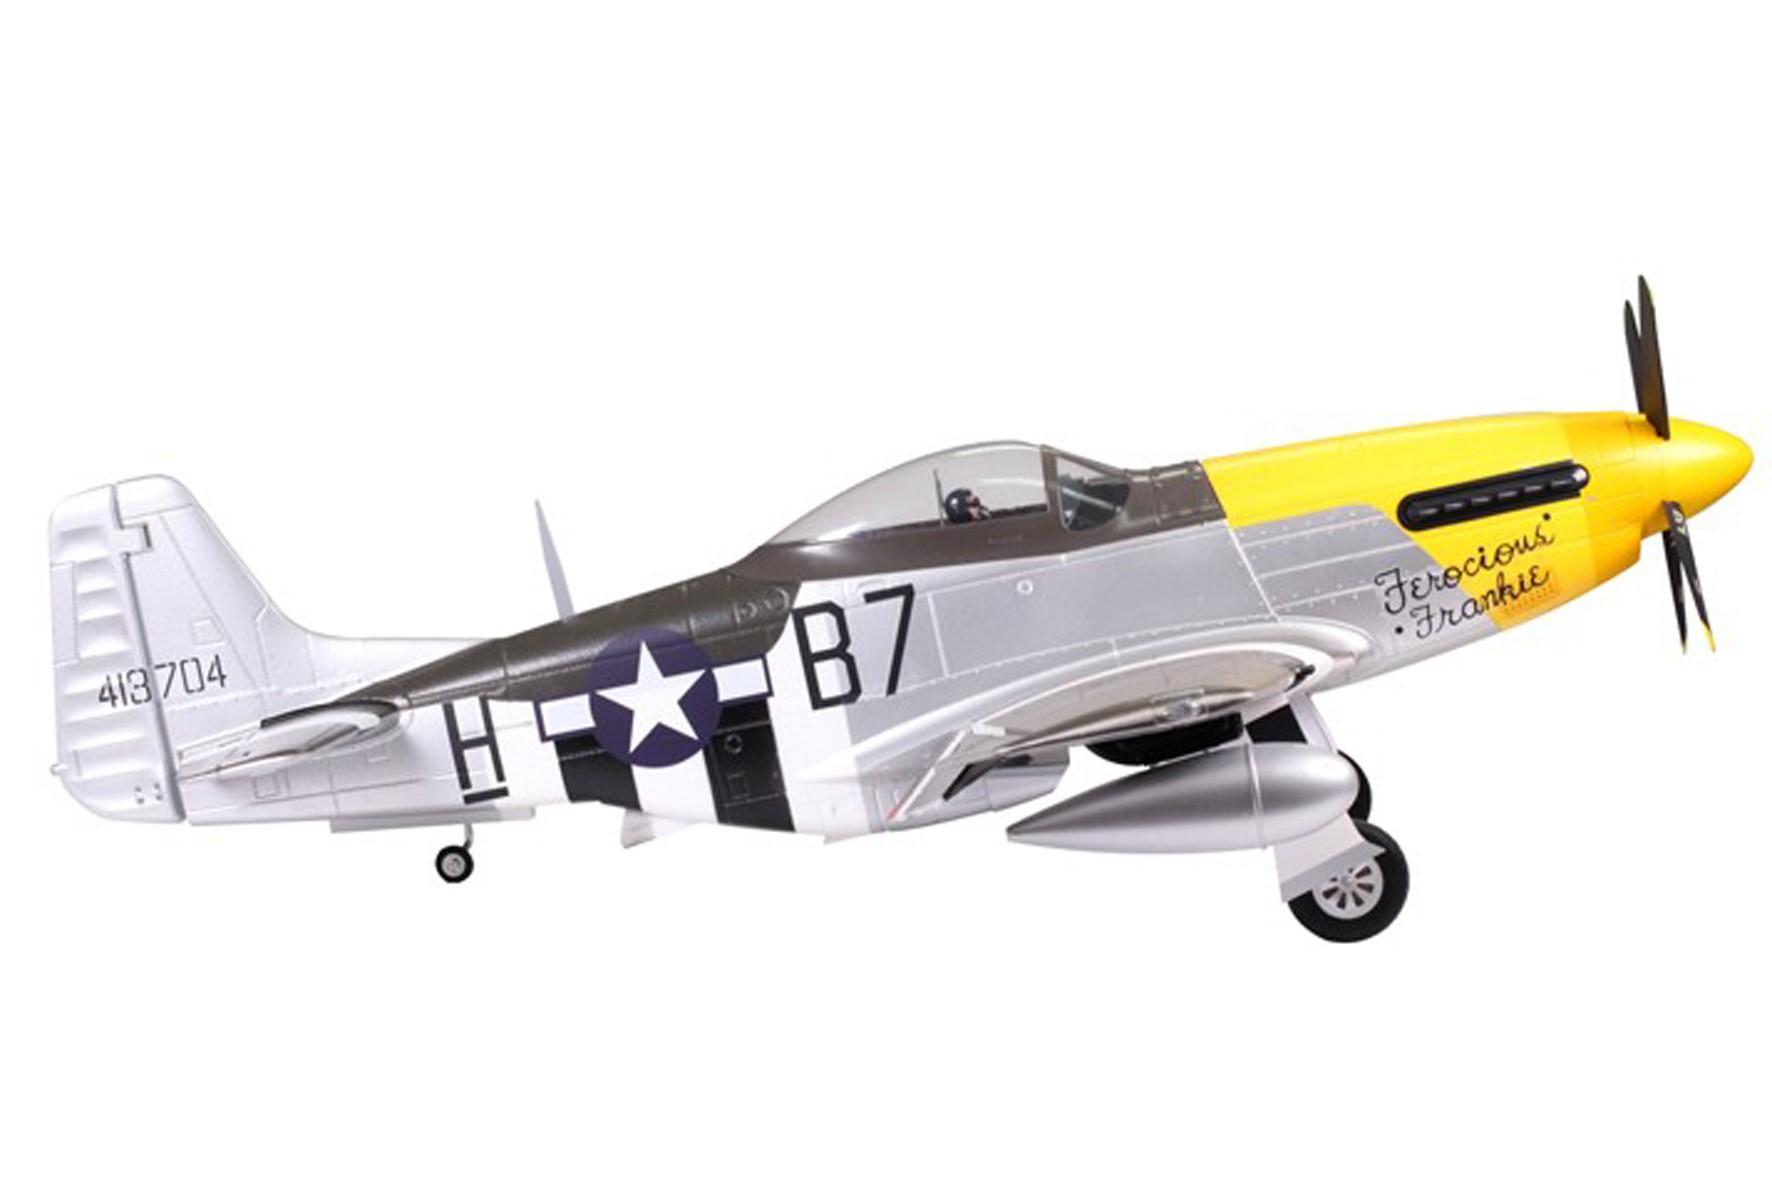 P51D Mustang-Ferocious Frankie fms